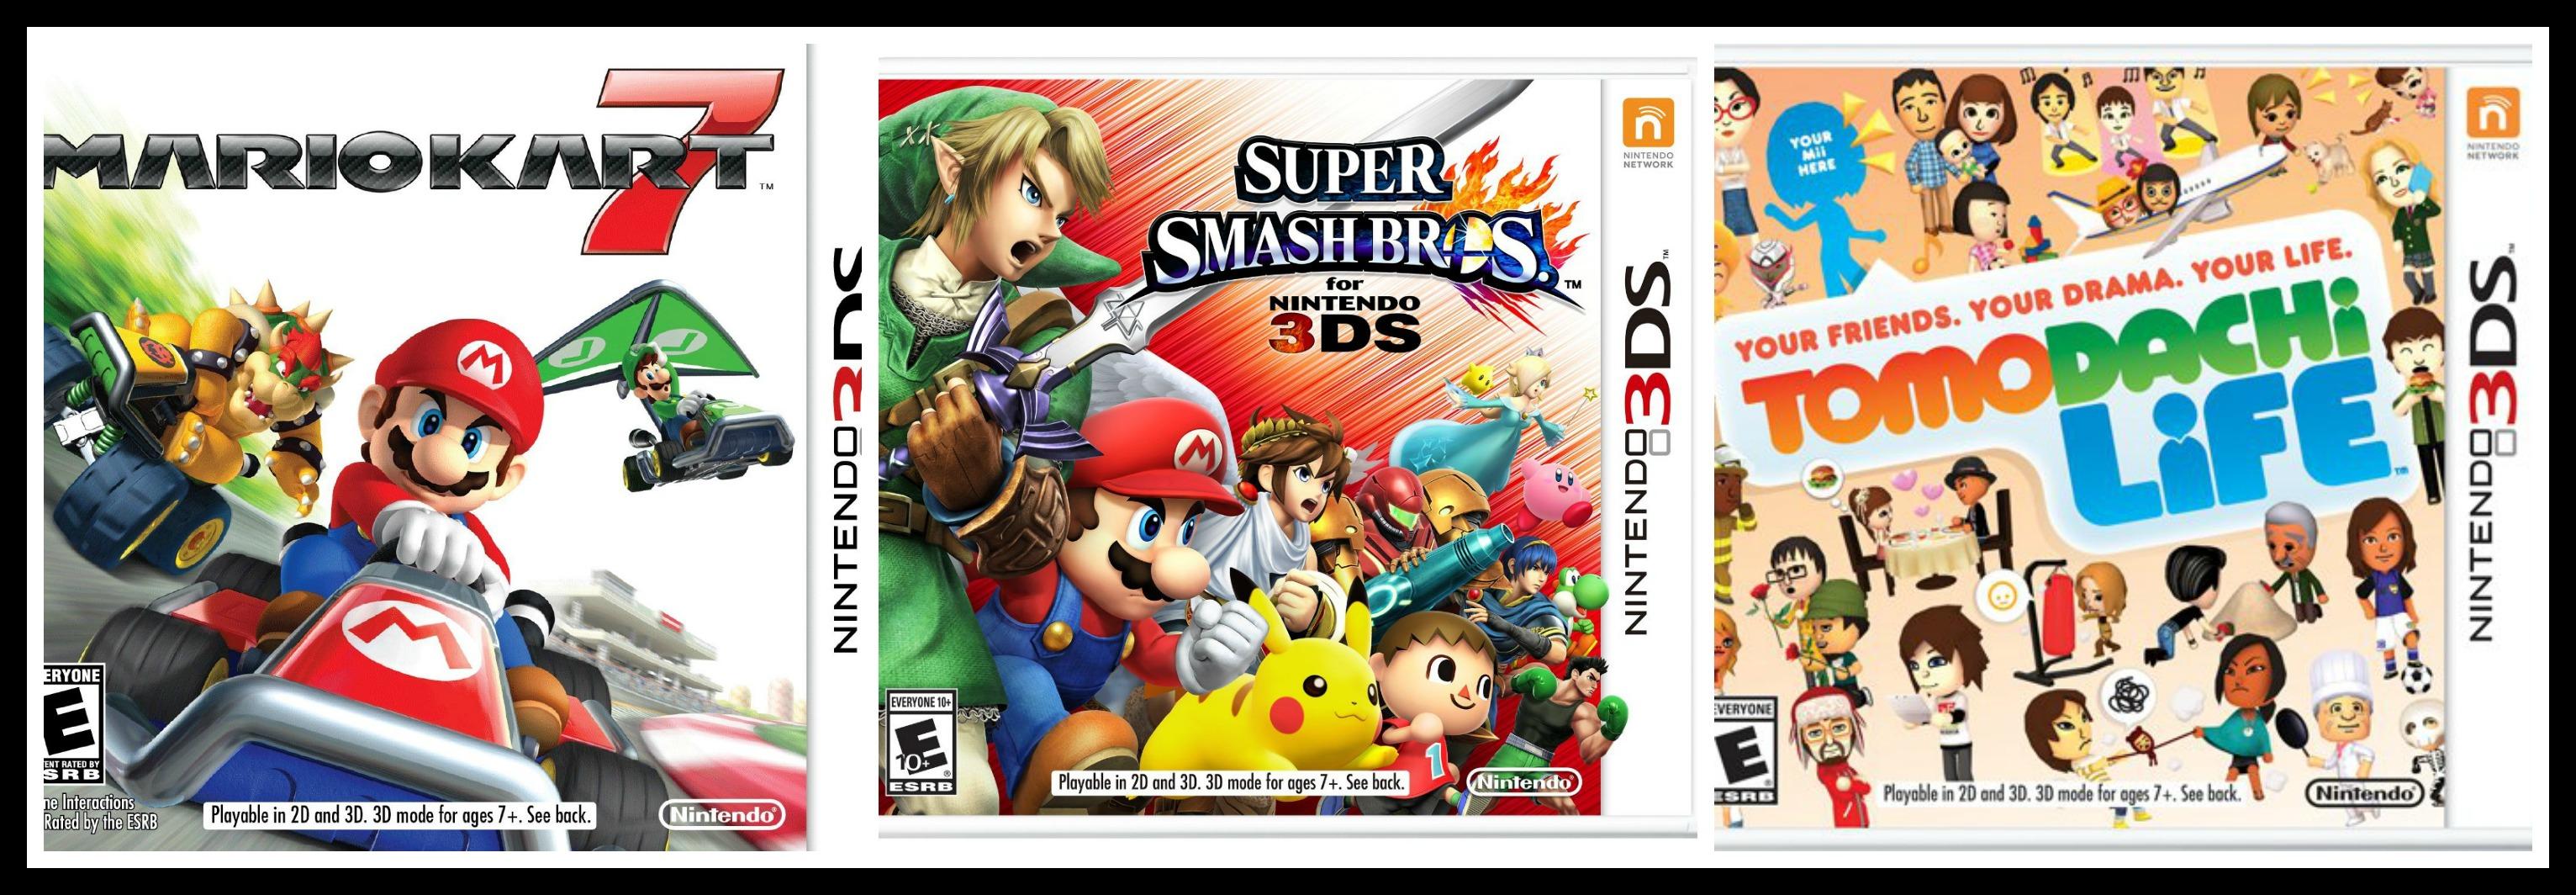 Nintendo 3ds Games For Boys Popular Nintendo 3ds Games